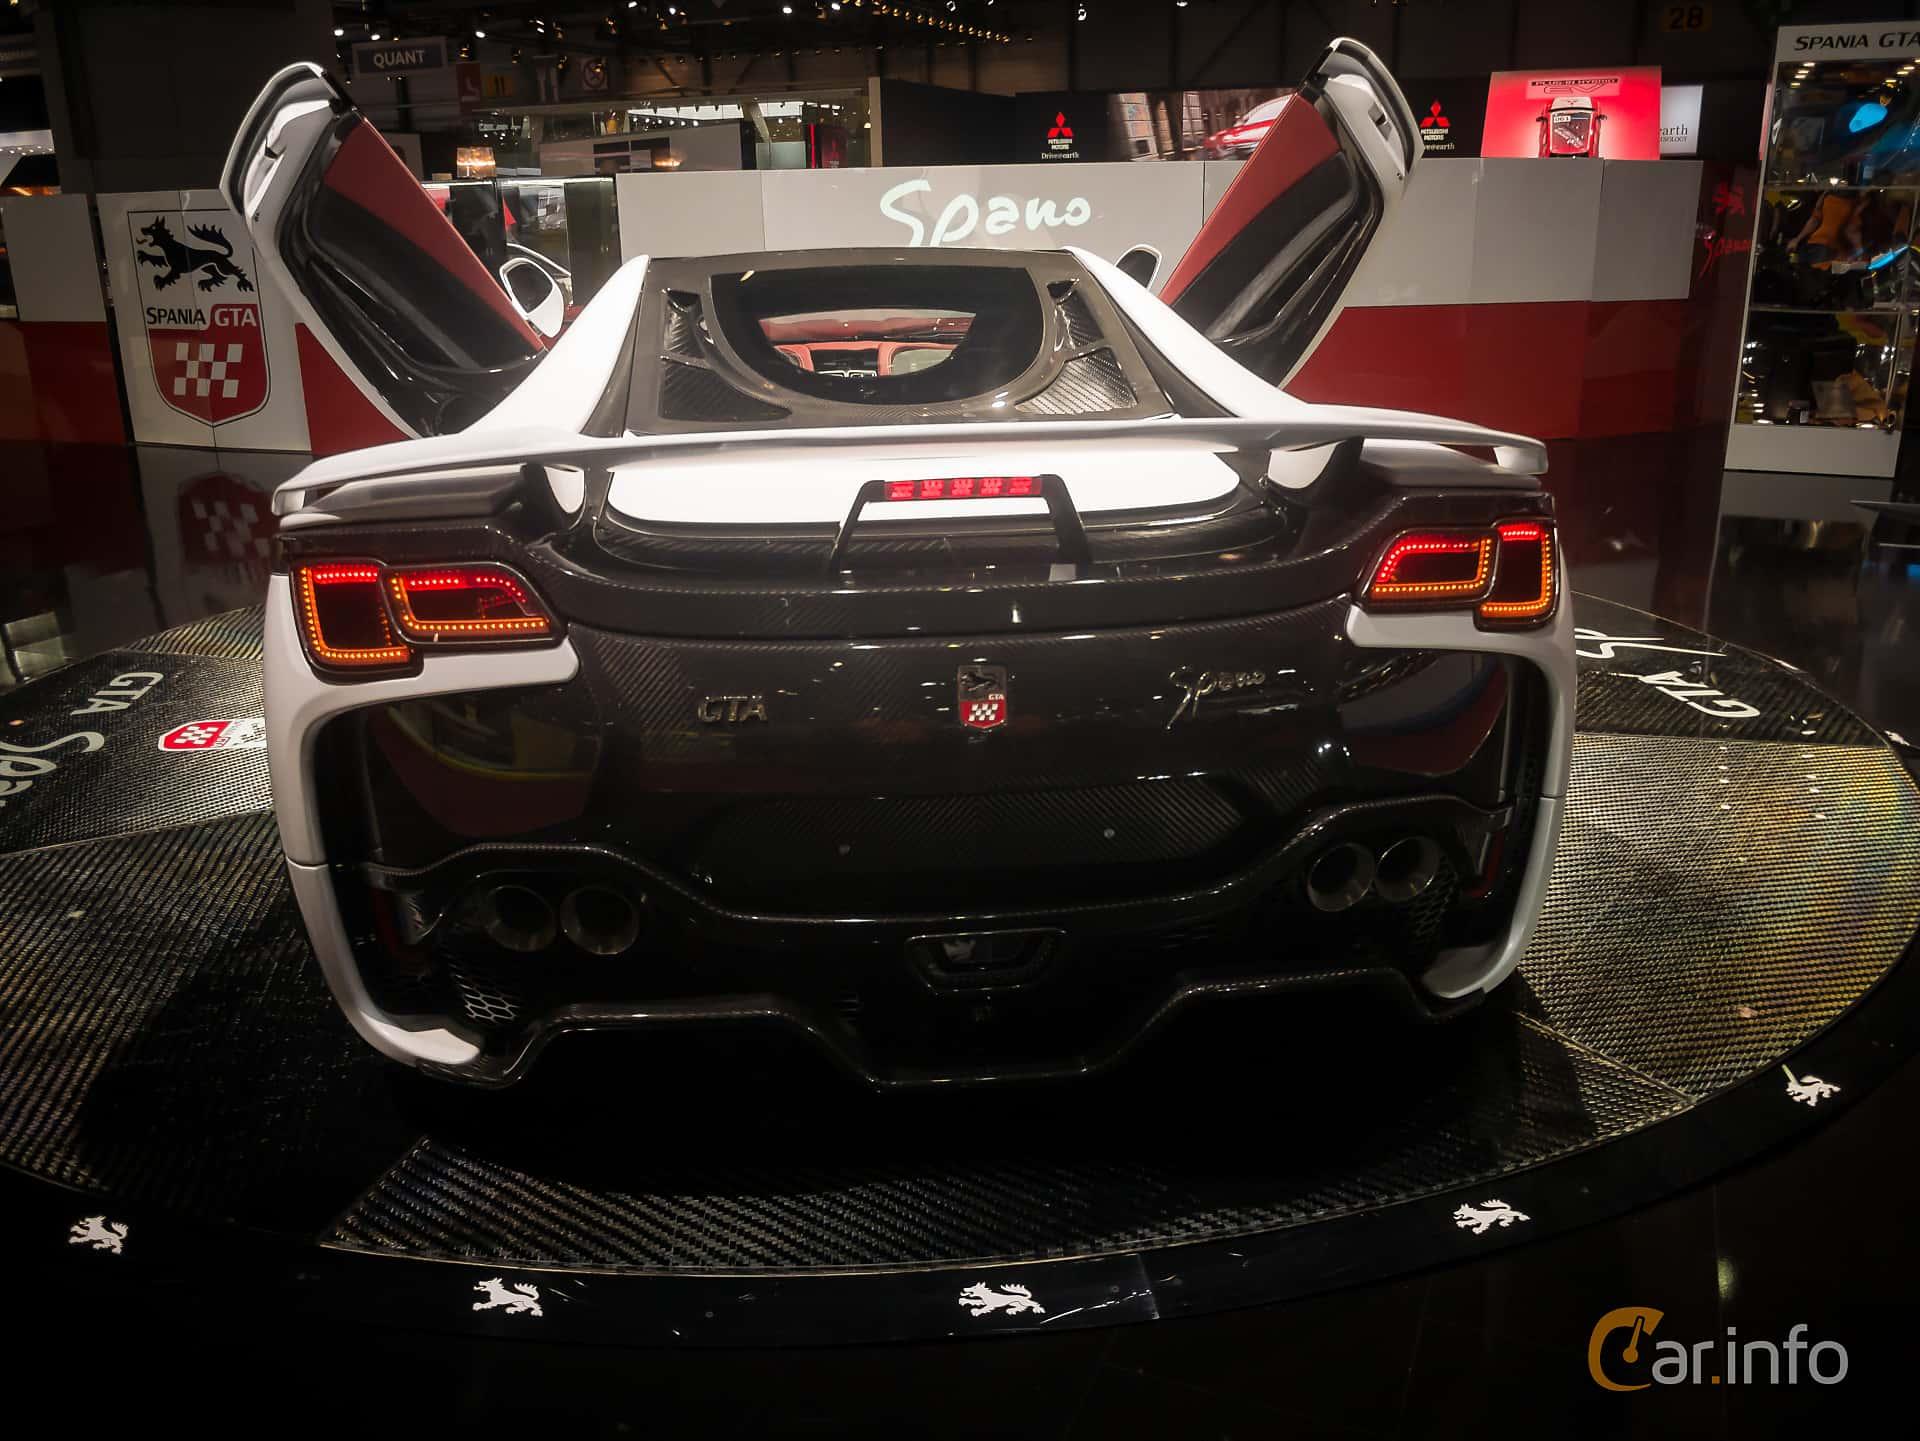 GTA Motor Spano 8.0 V10 Sequential, 938hp, 2015 at Geneva Motor Show 2015